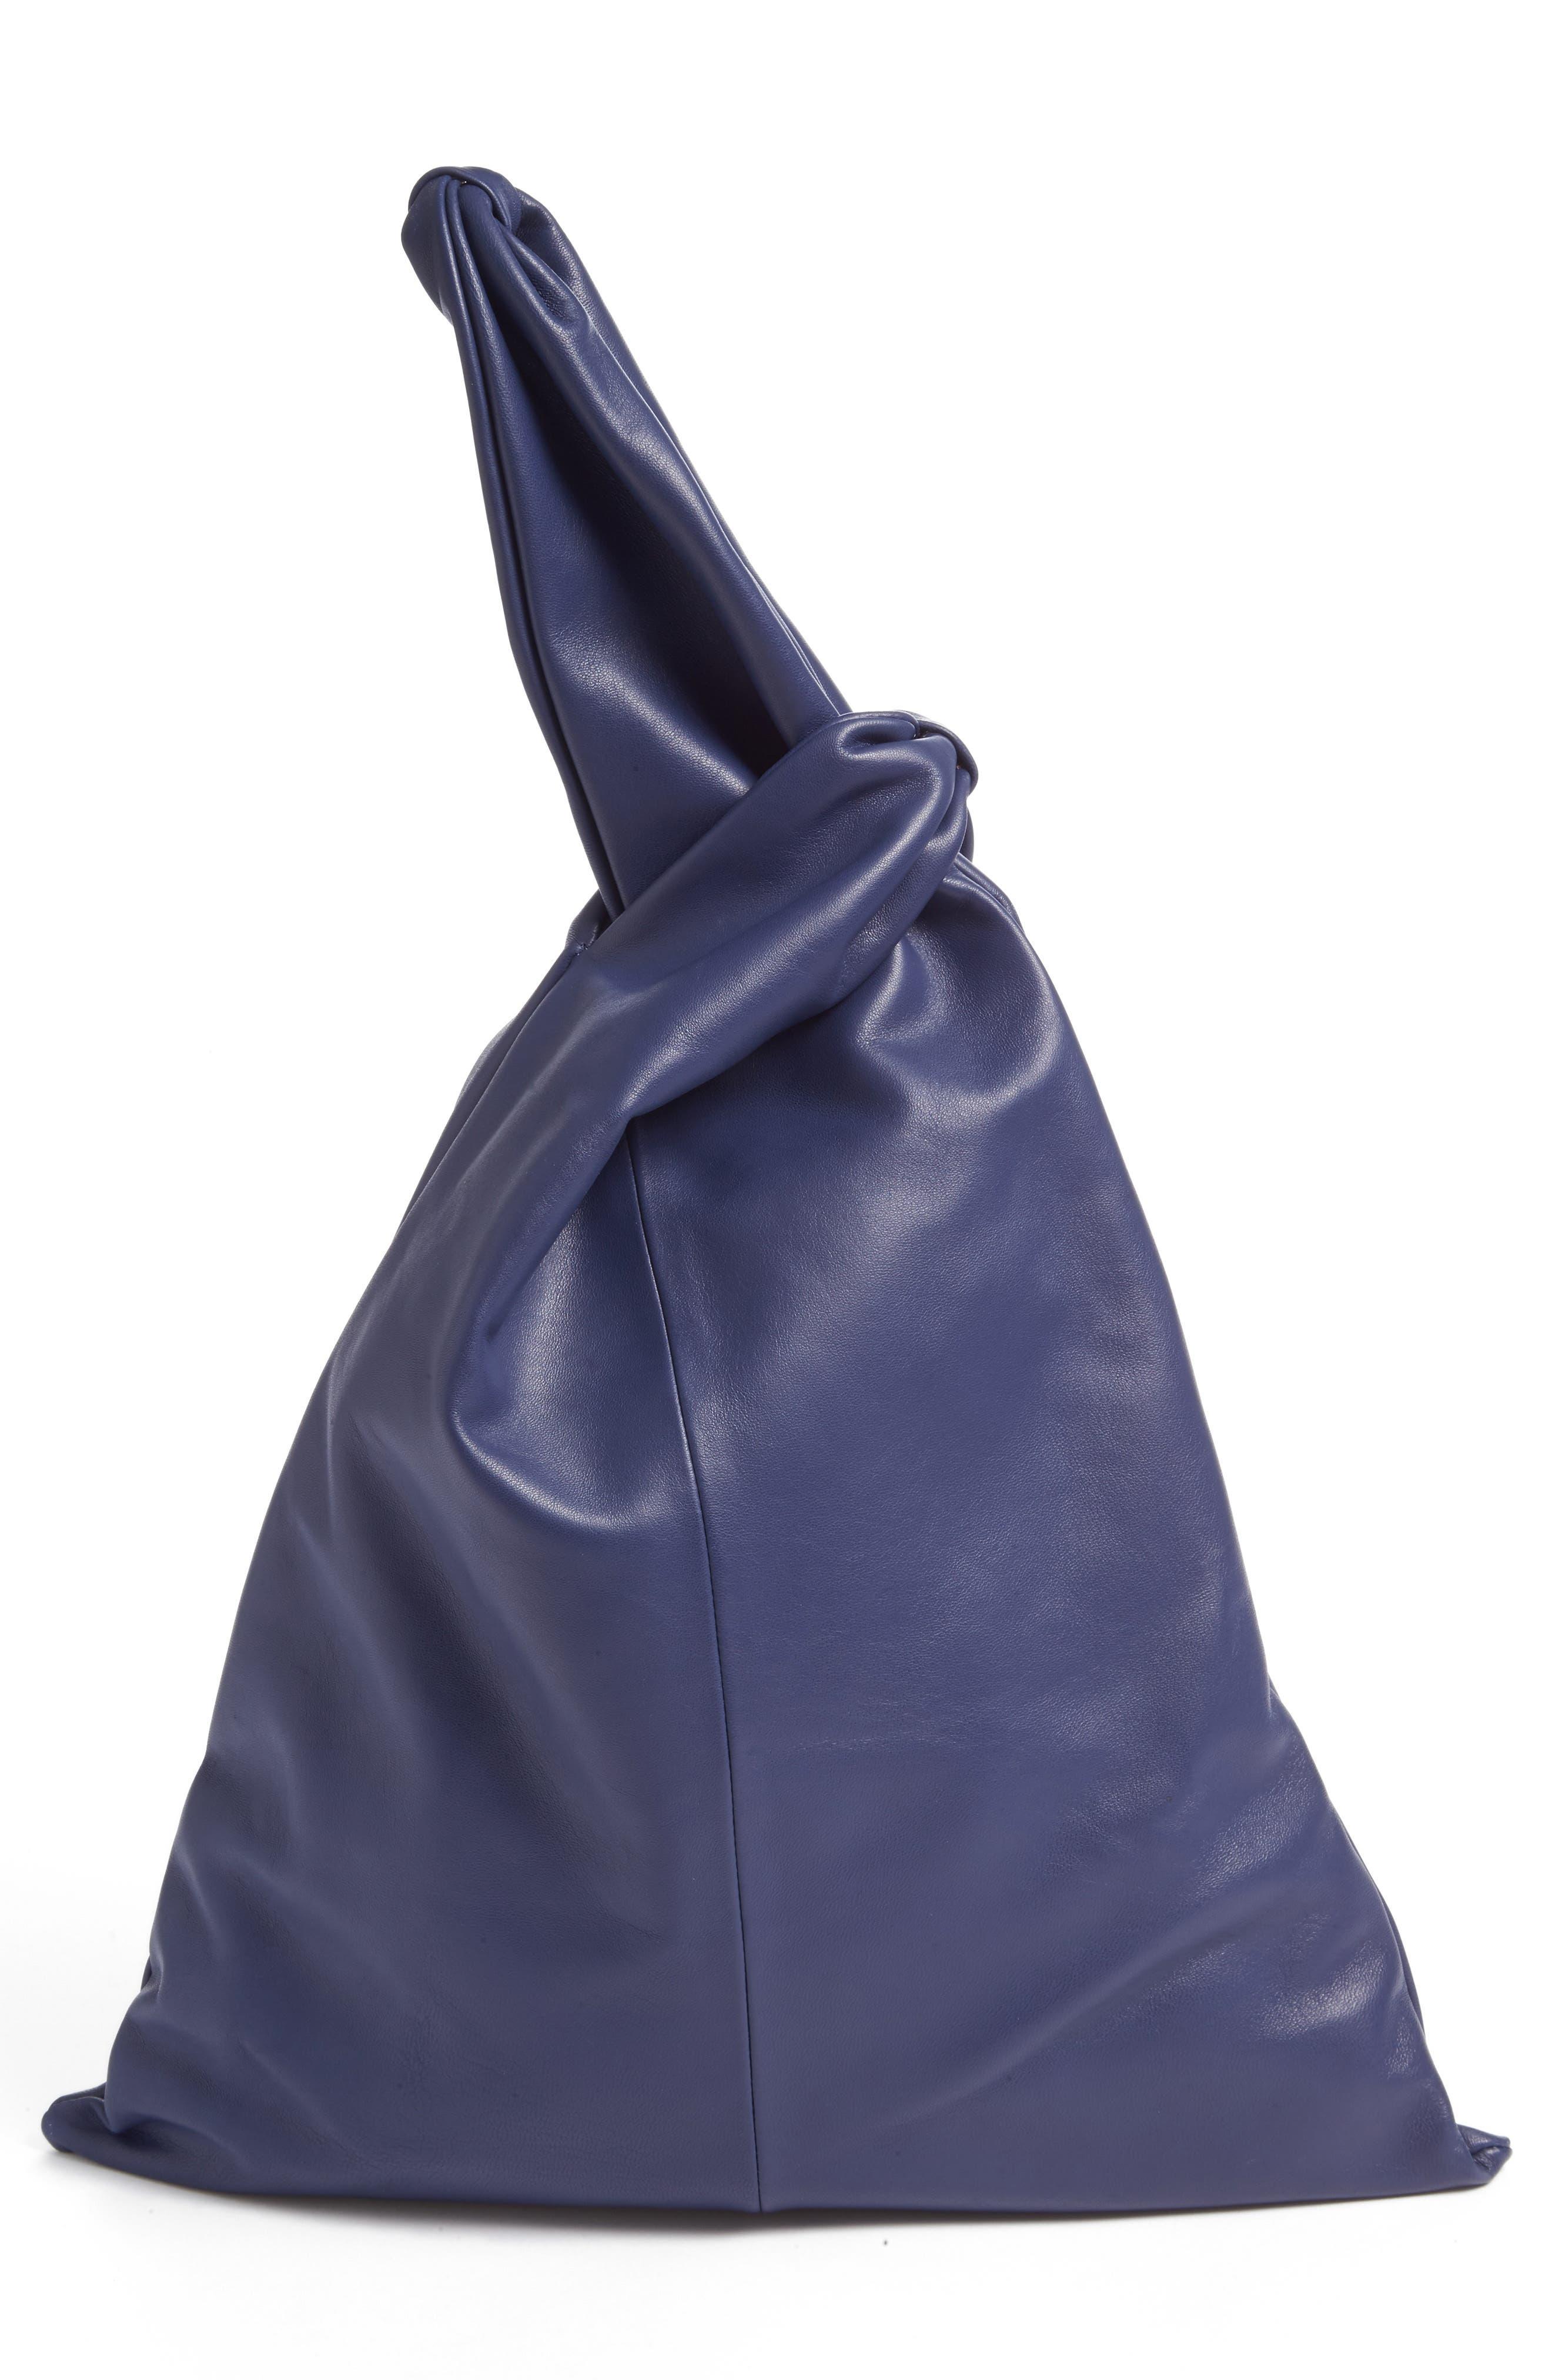 Creatures of Comfort Large Nappa Leather Malia Bag